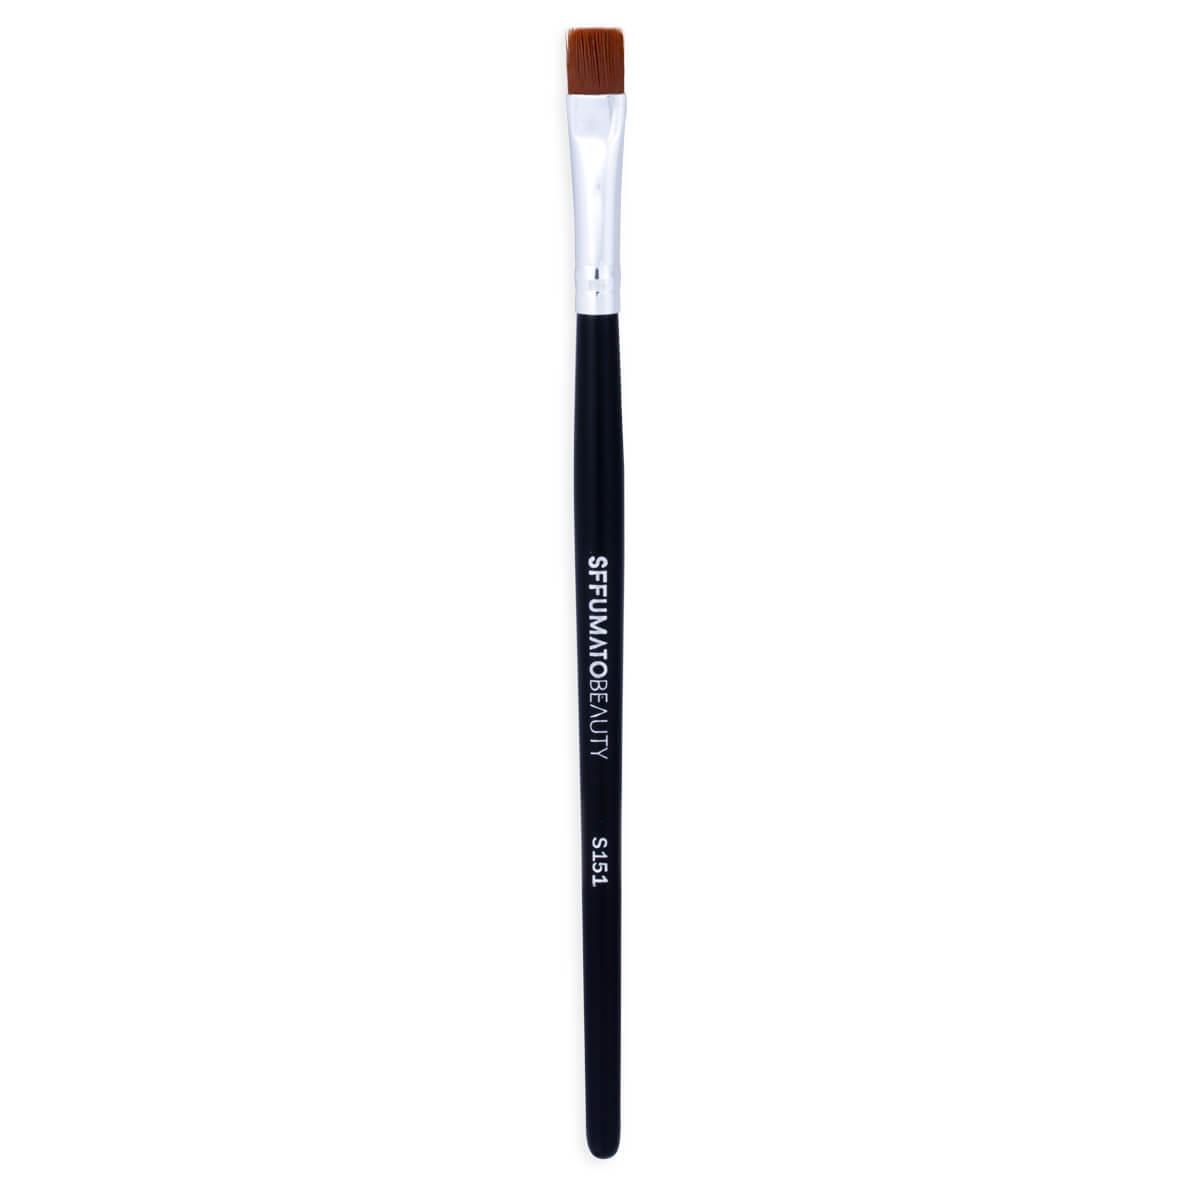 S151 - Pincel Para Delinear Profissional Sffumato Beauty